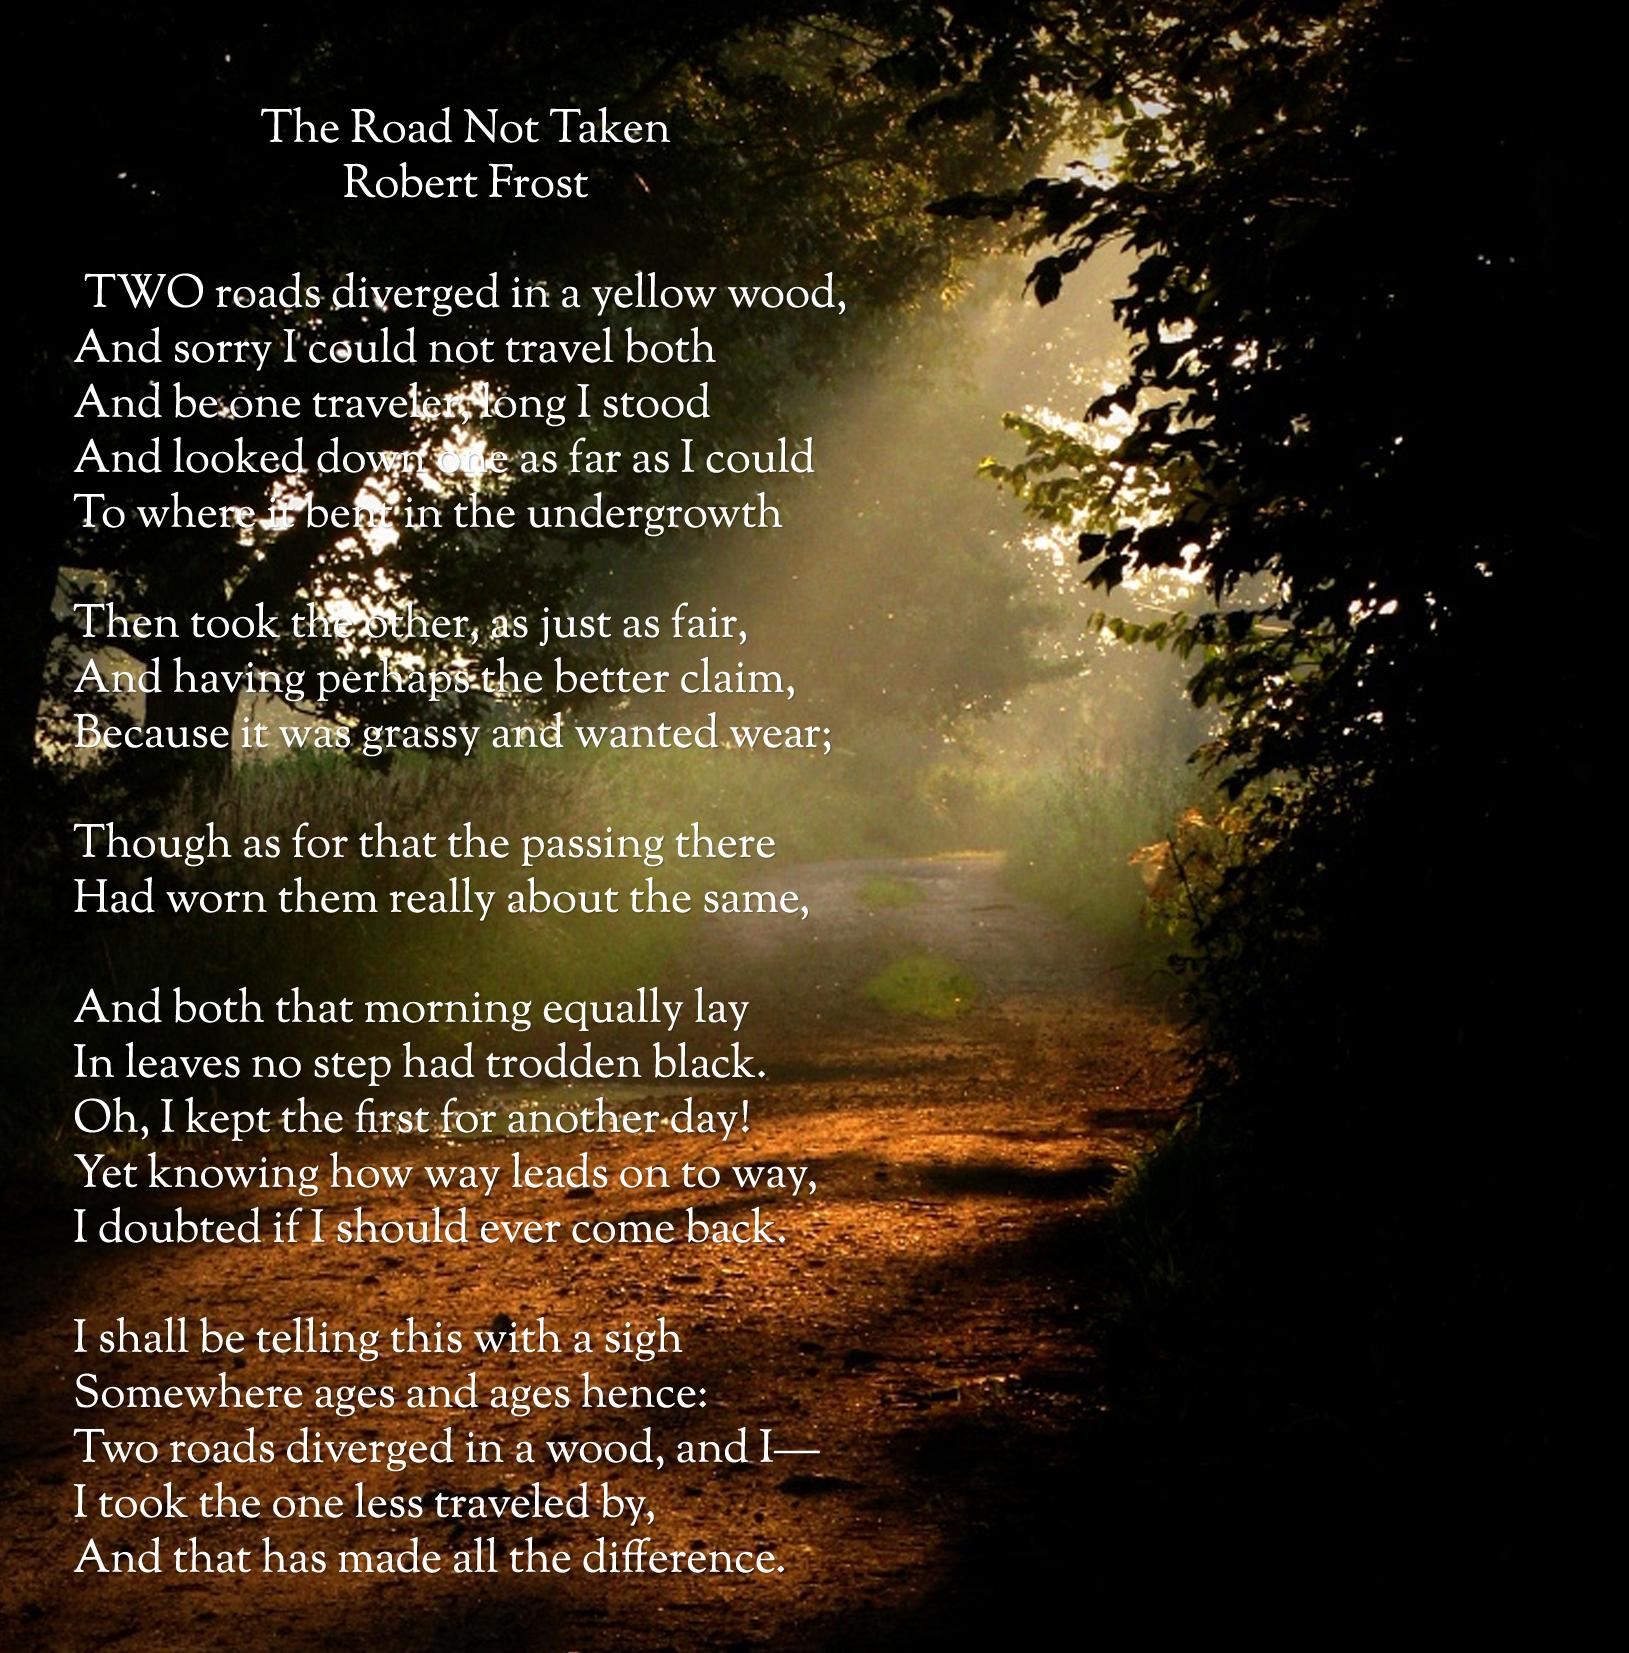 robert frost road not taken Популярные тексты песен и переводы robert frost the road not taken.